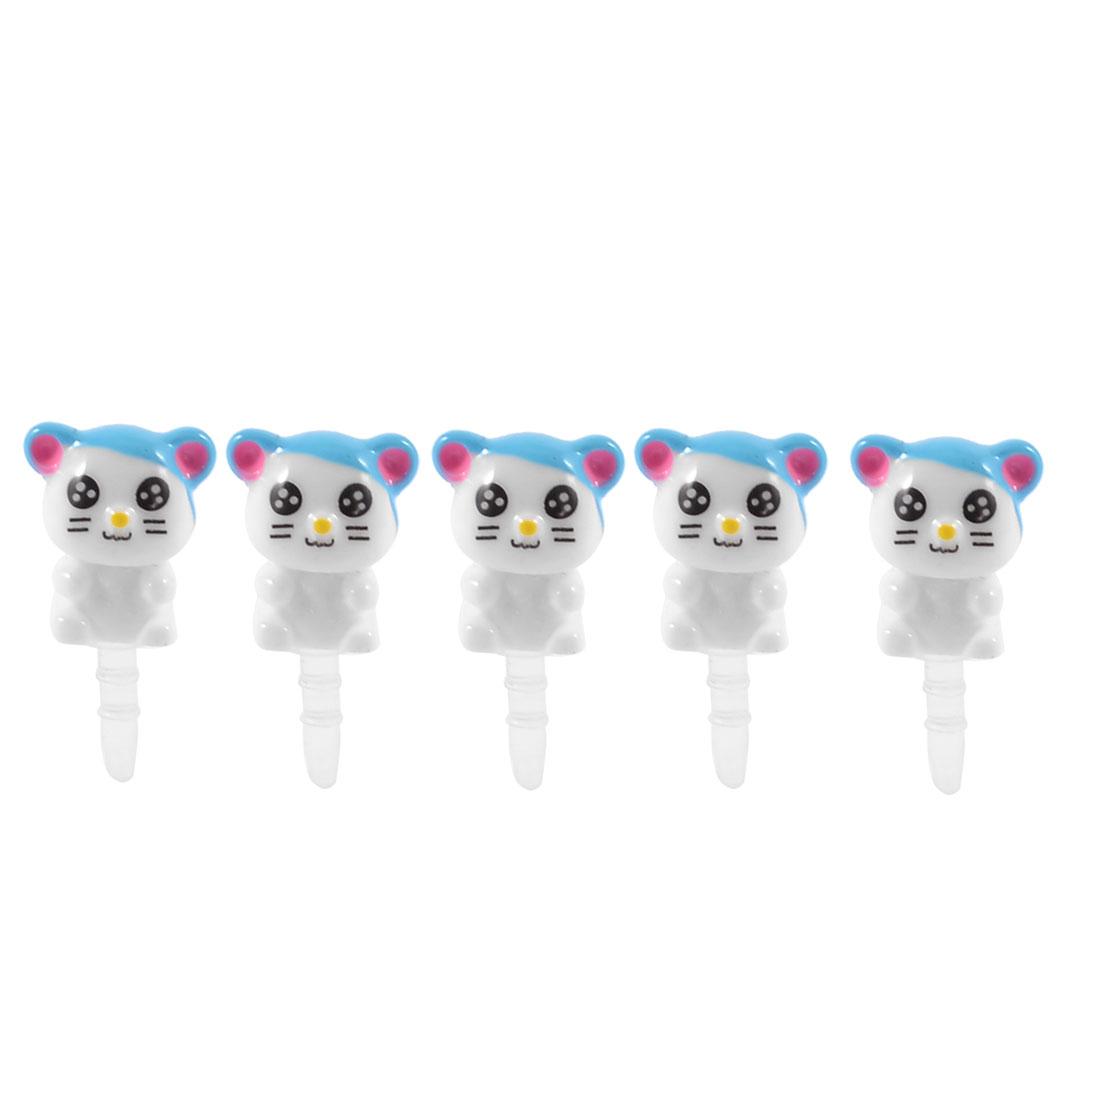 5 Pcs Plastic Cat 3.5mm Earphone Anti Dust Ear Cap Stopper for Smartphone